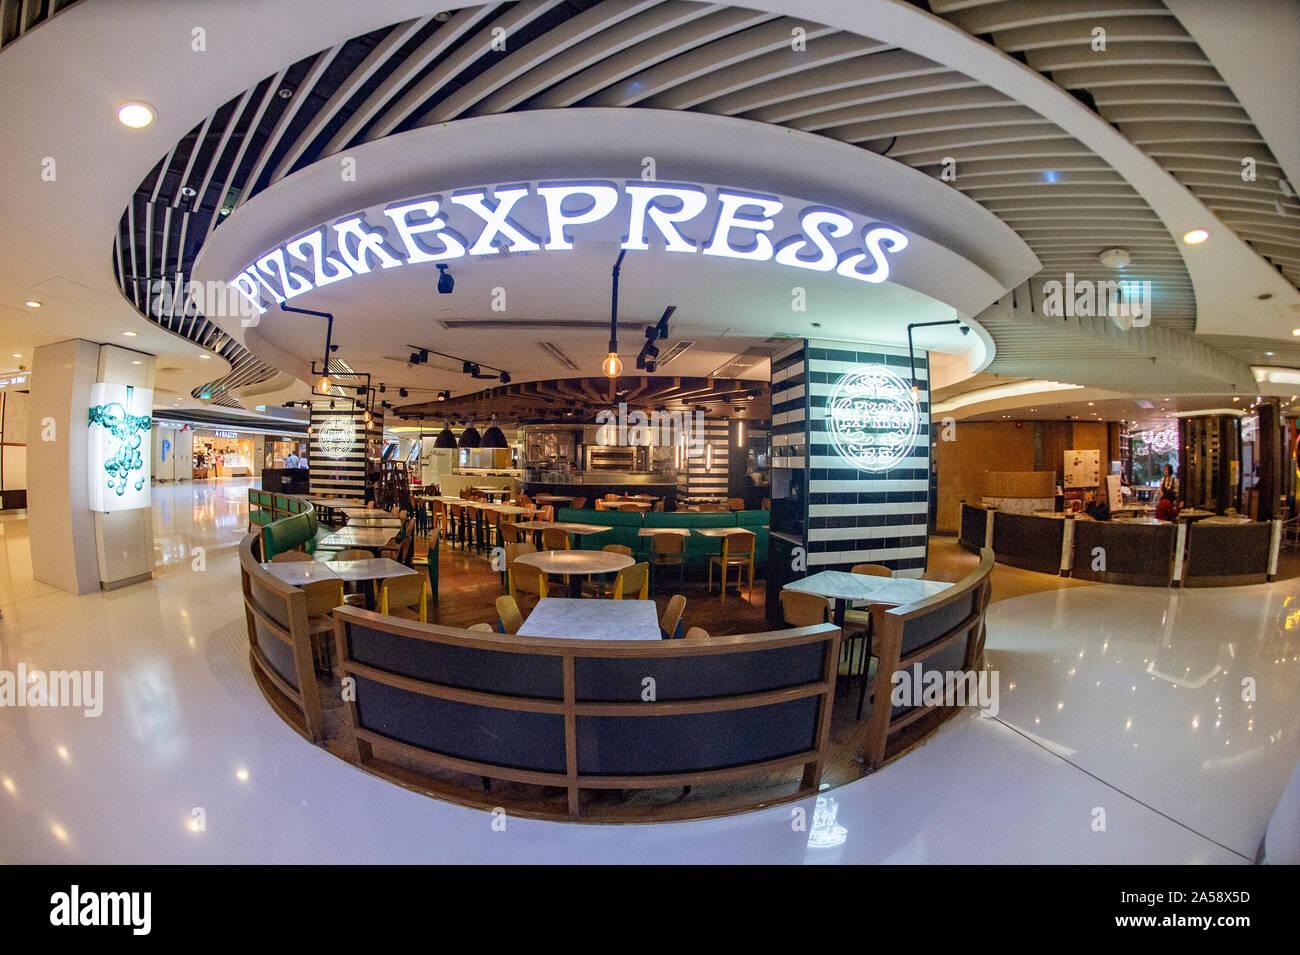 Pizza Express Restaurants Stock Photos Pizza Express